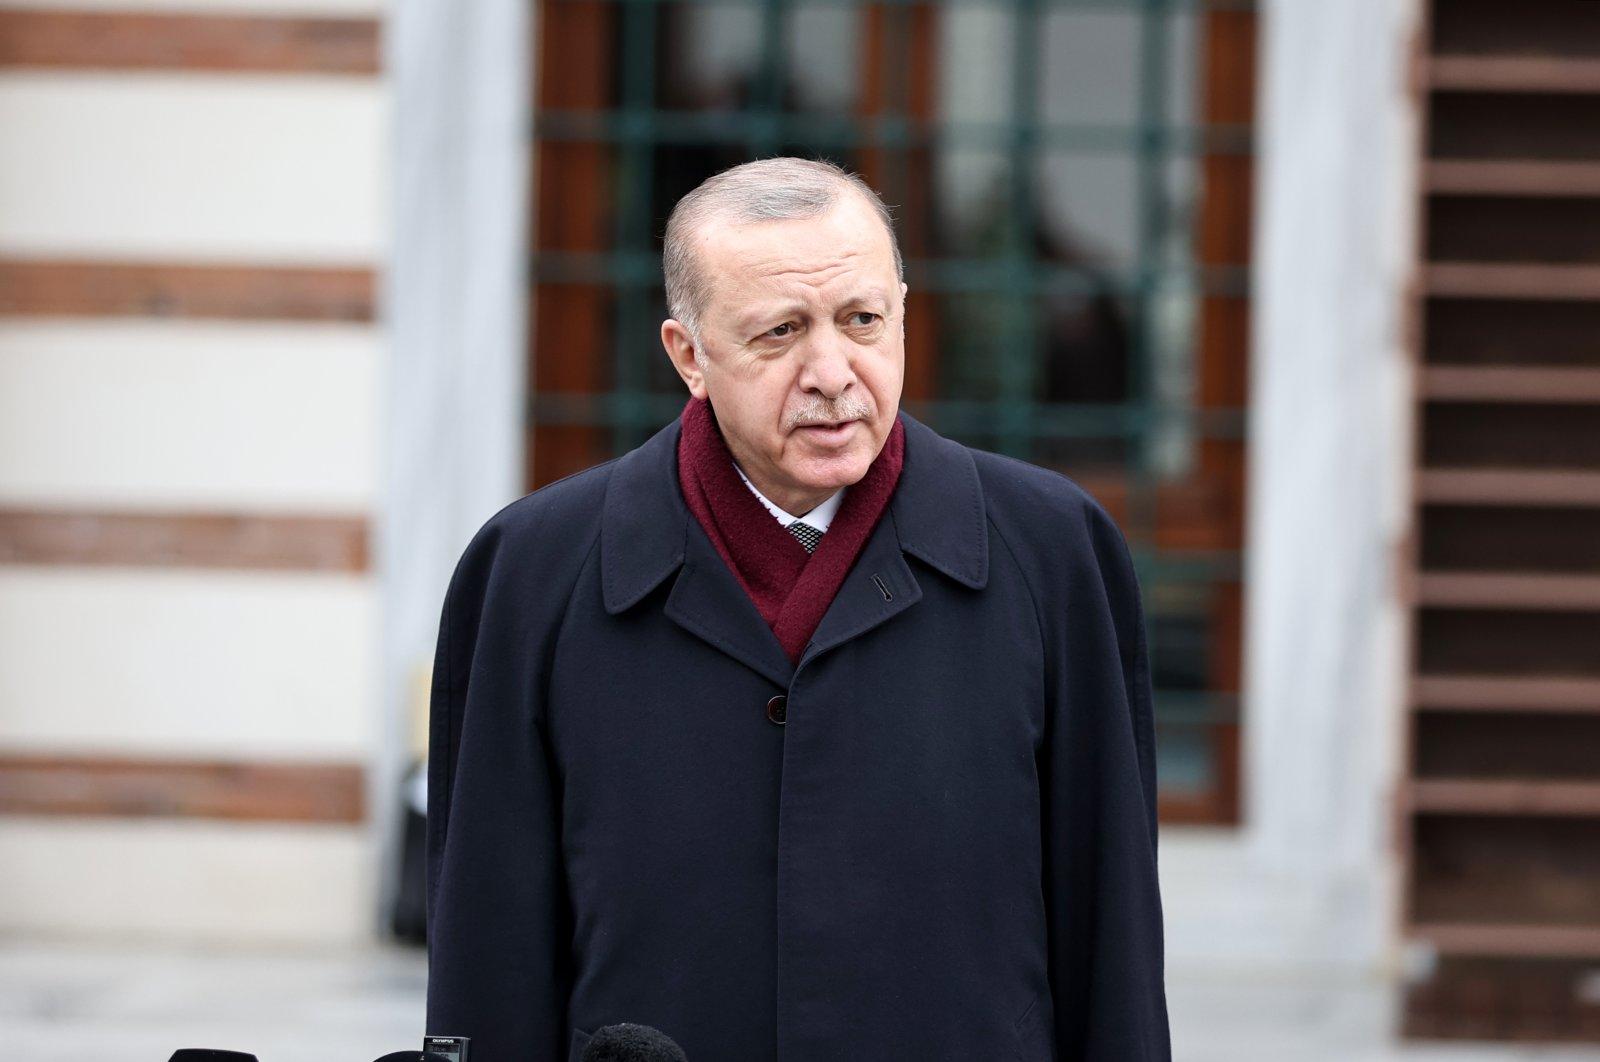 President Recep Tayyip Erdoğan speaks to journalists in Kerem Aydınlar Mosque, Istanbul, Turkey, March 19, 2021. (Anadolu Agency)